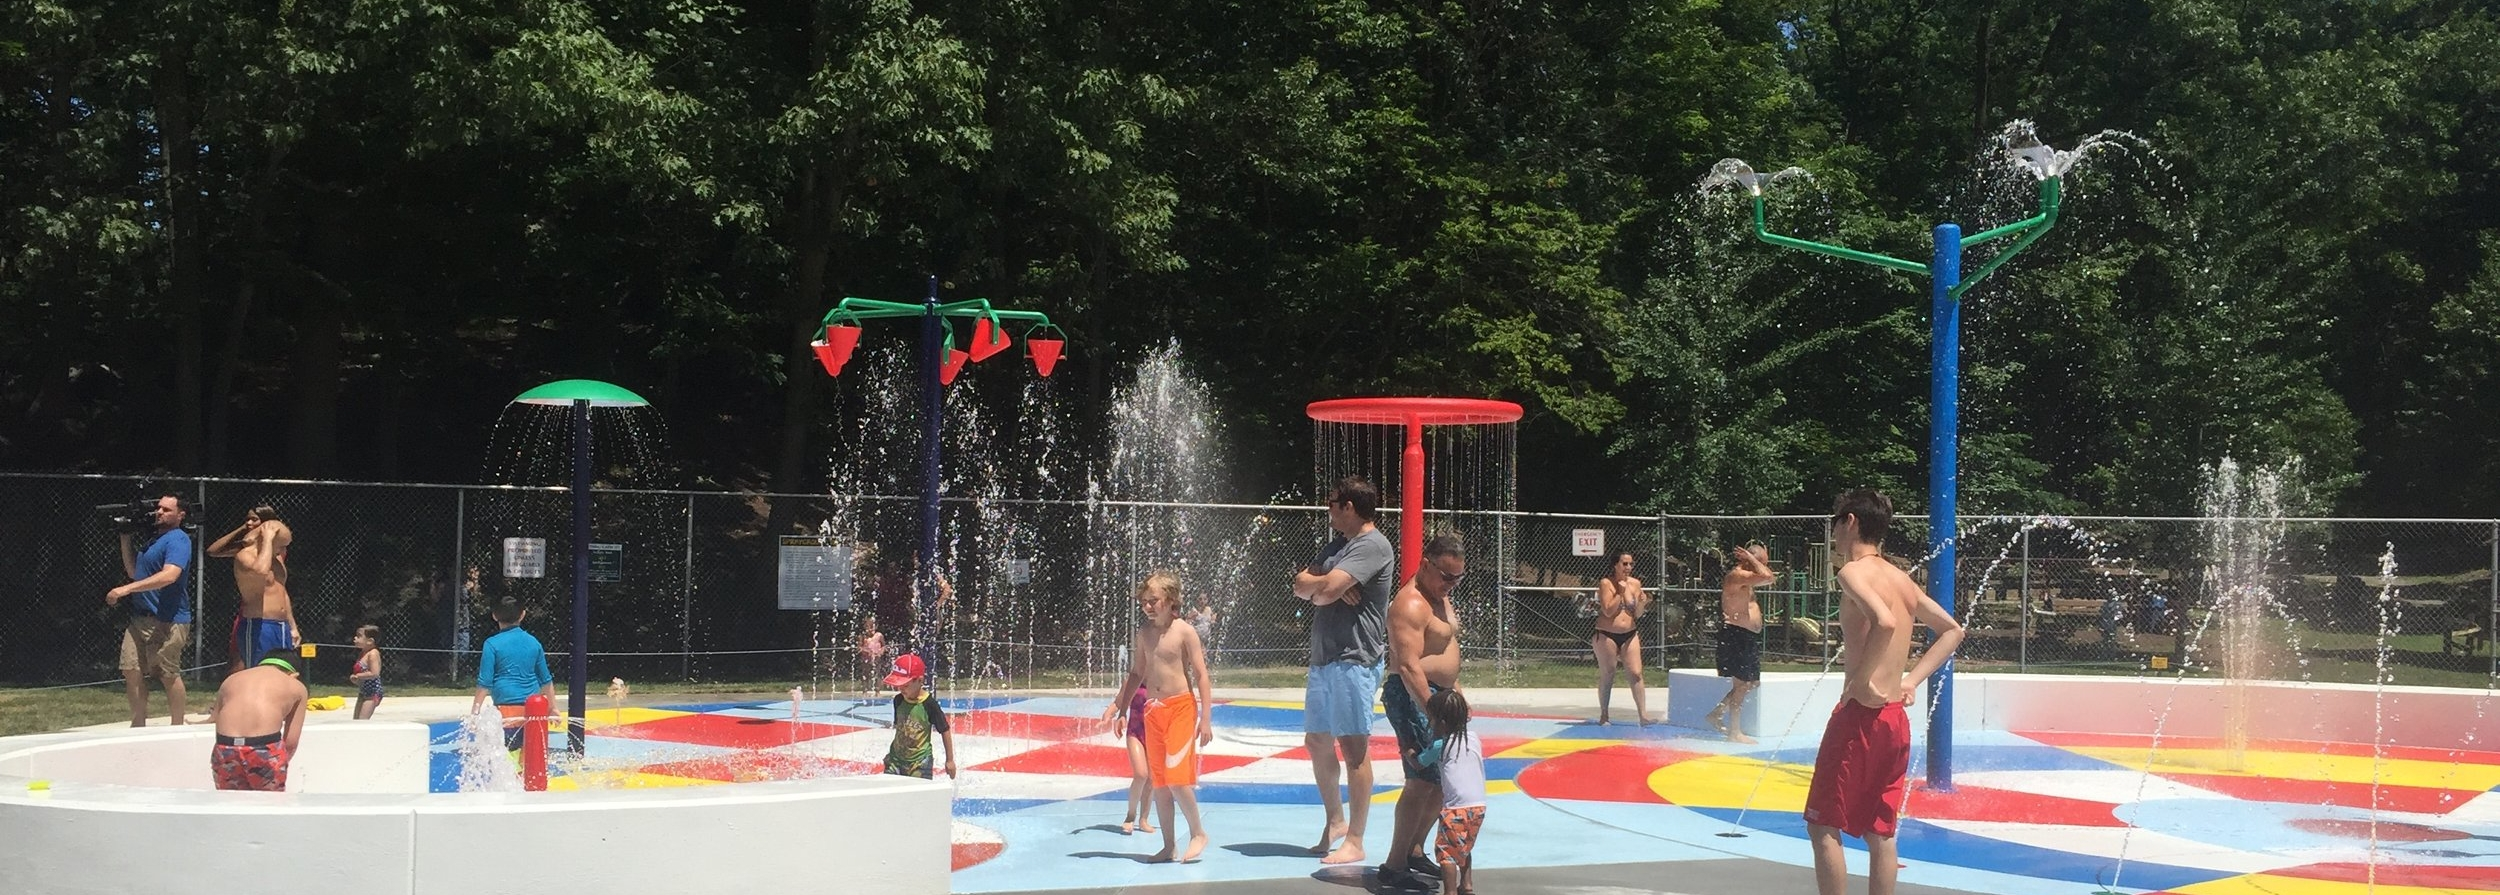 Sprain Ridge spray park is set to re-open in 2019.